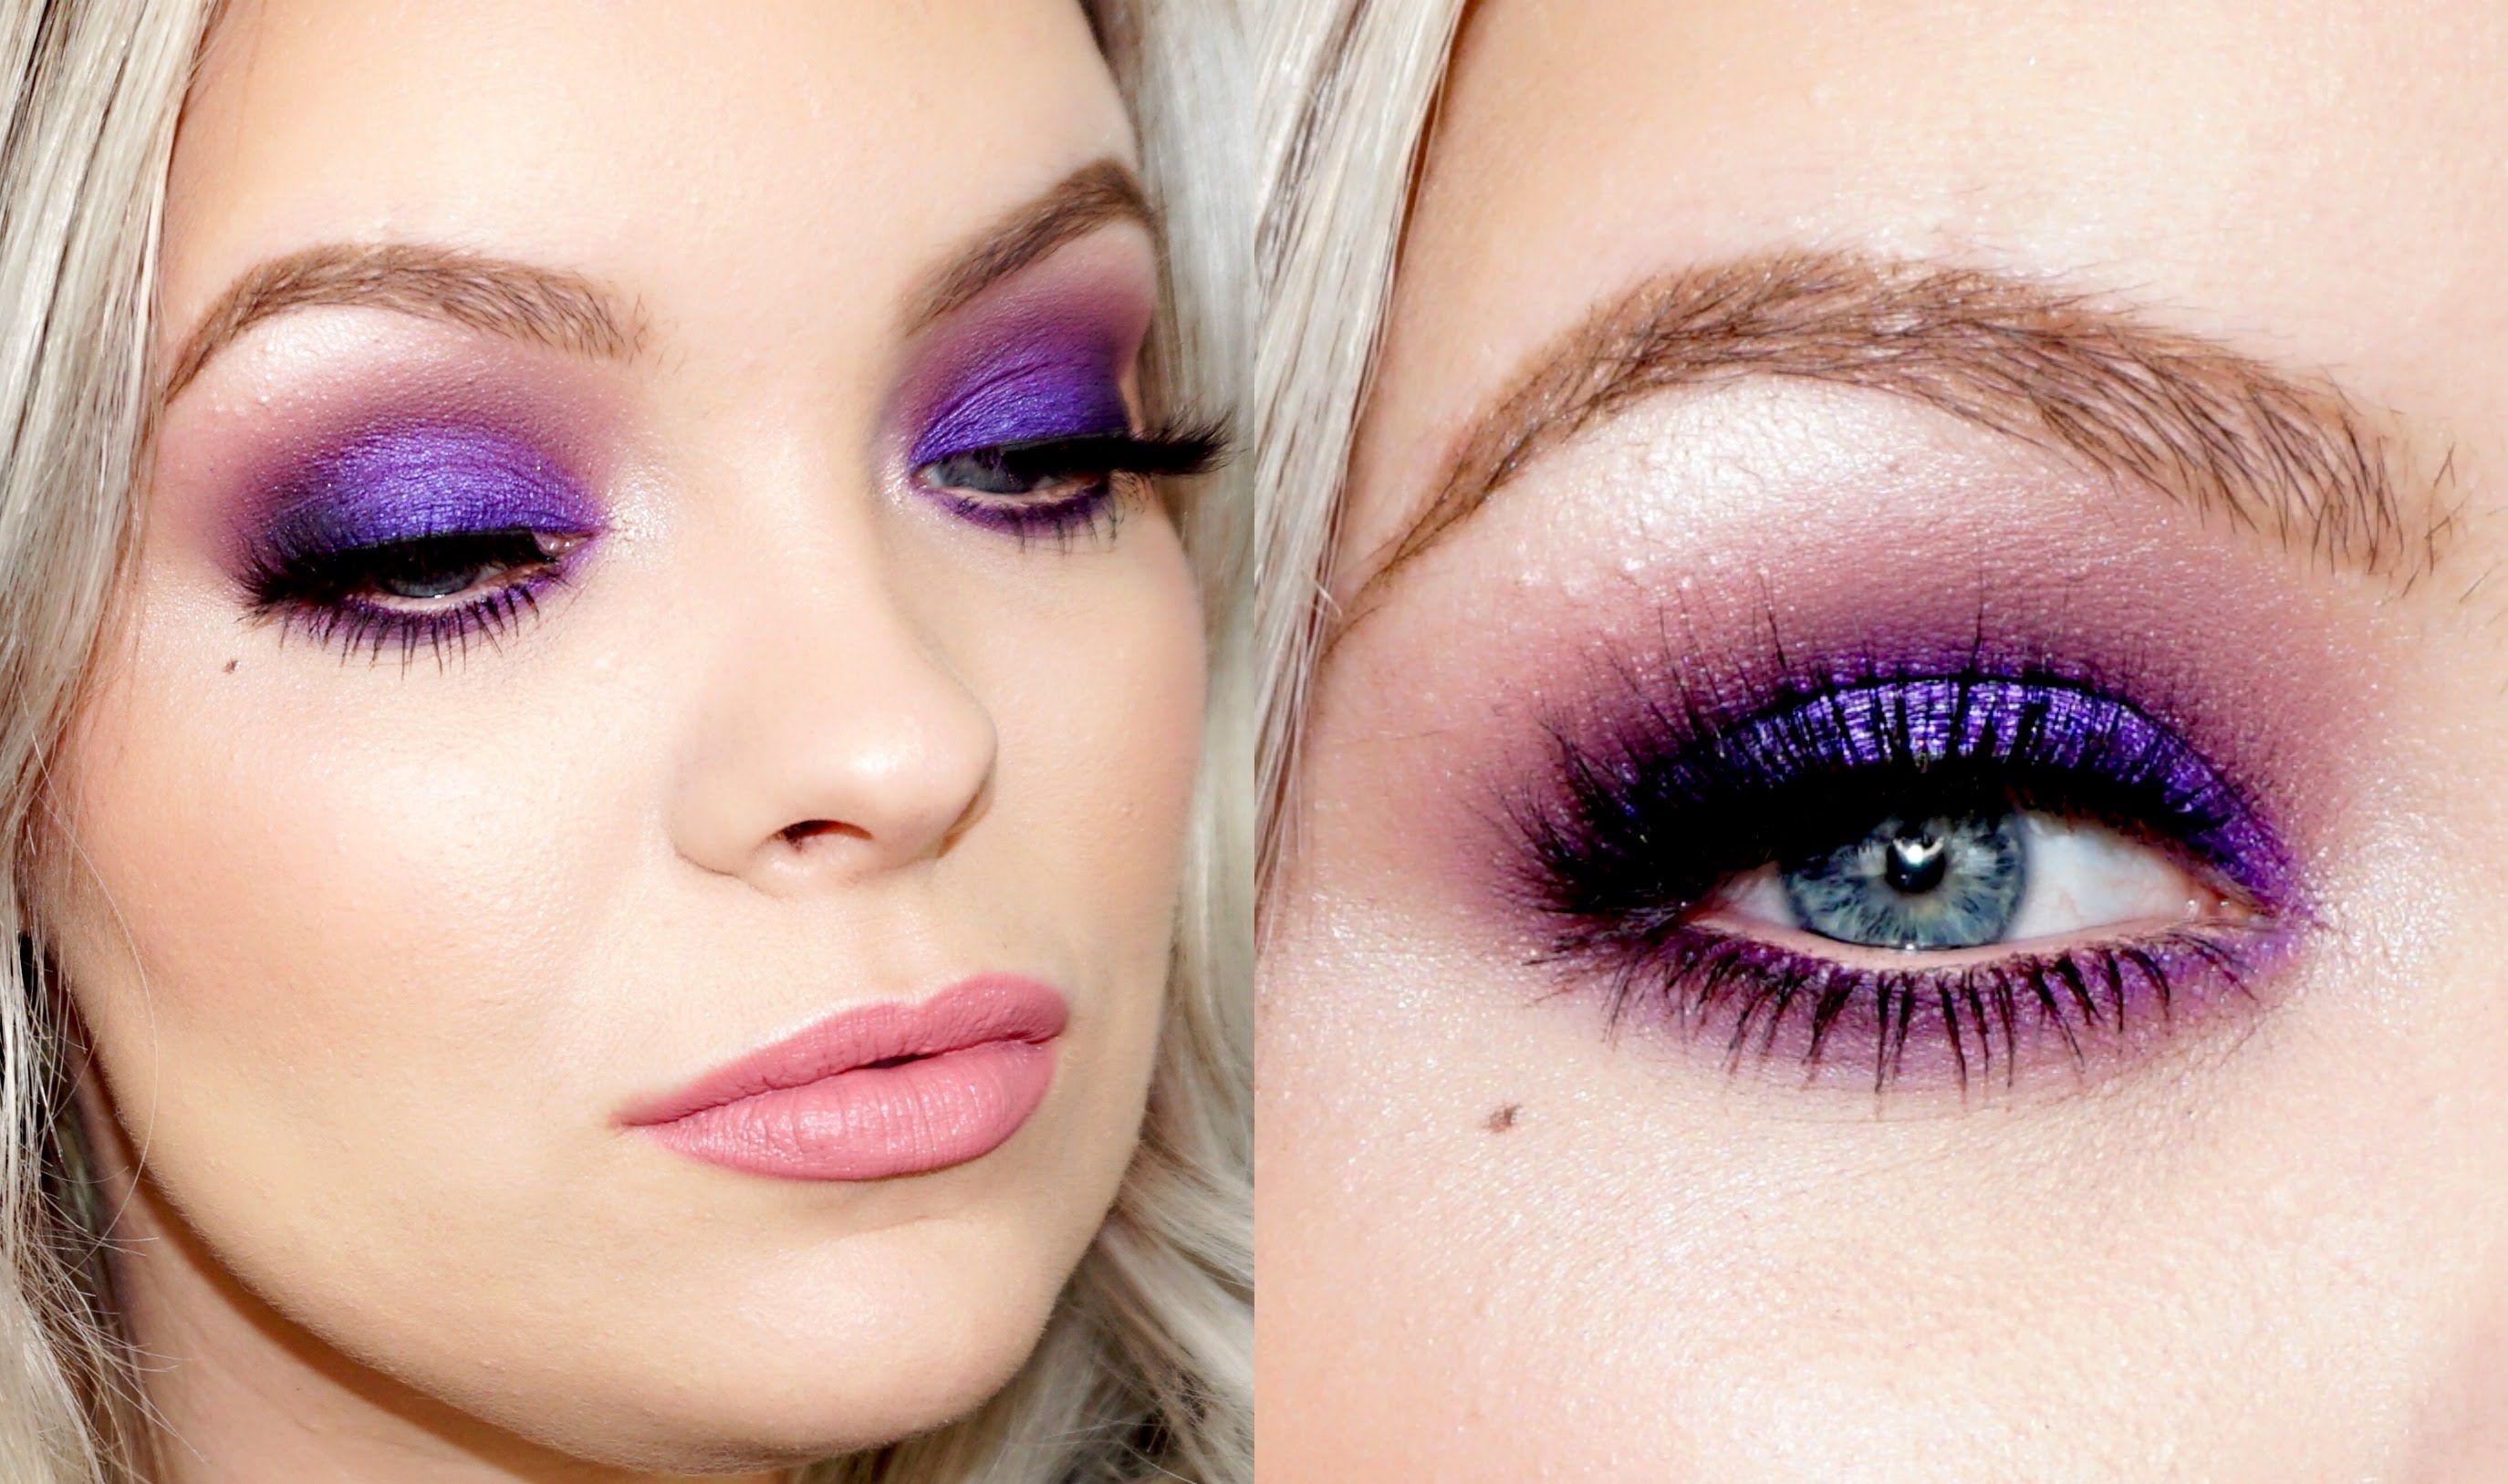 Party Purple Smokey Eyes - Colorful & Electric | Brianna Fox